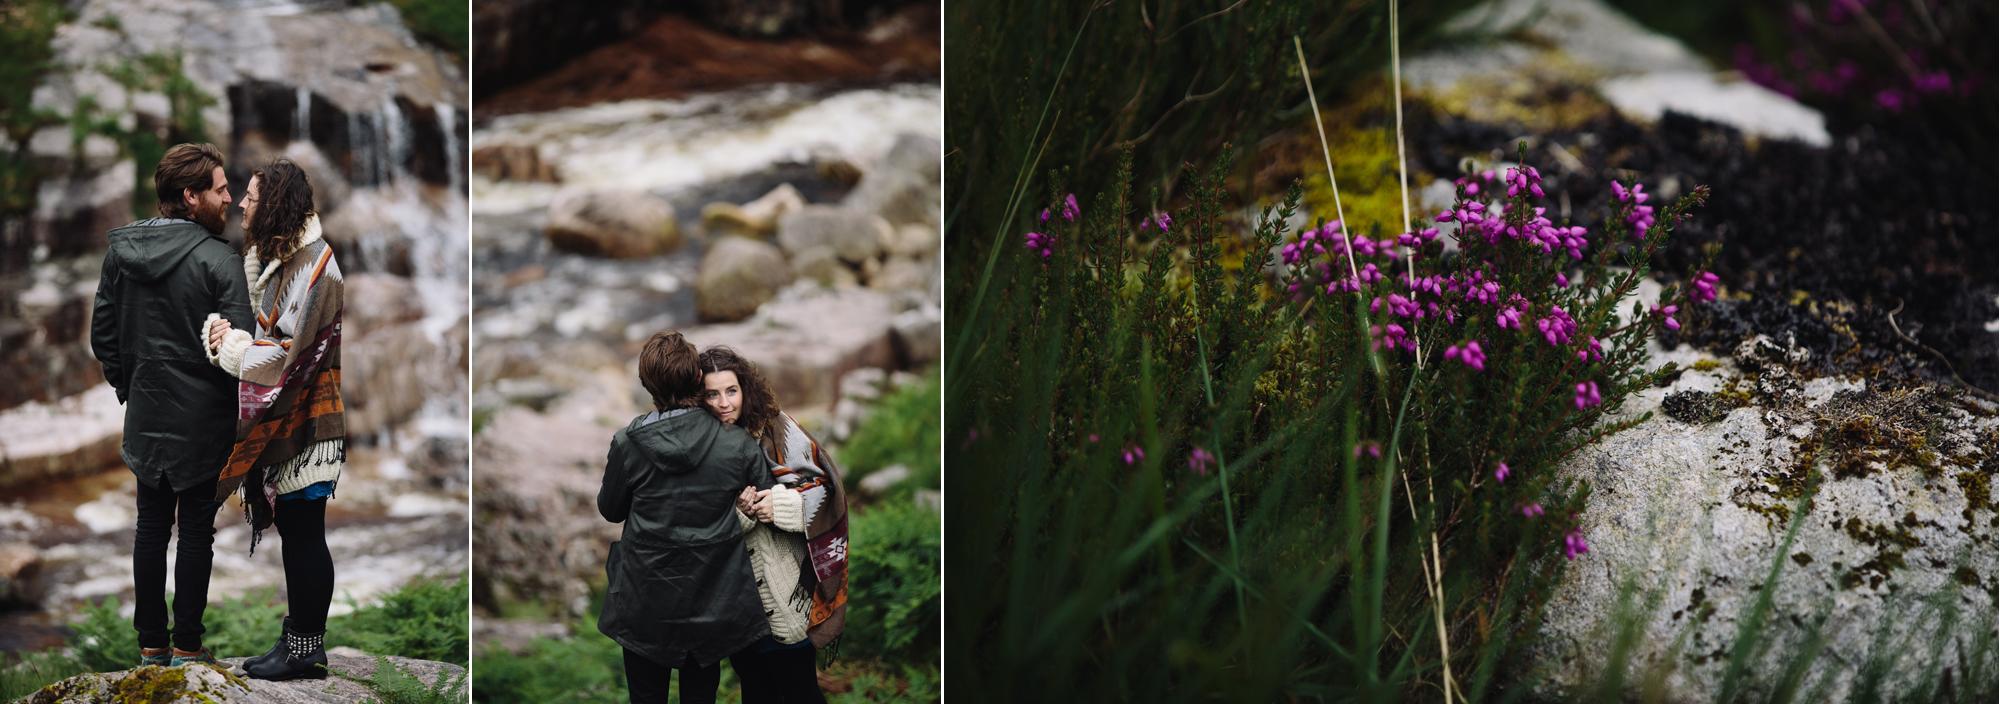 Hermione McCosh Photography - couple photoshoot in Glencoe, Scotland, creative and romantic portraits